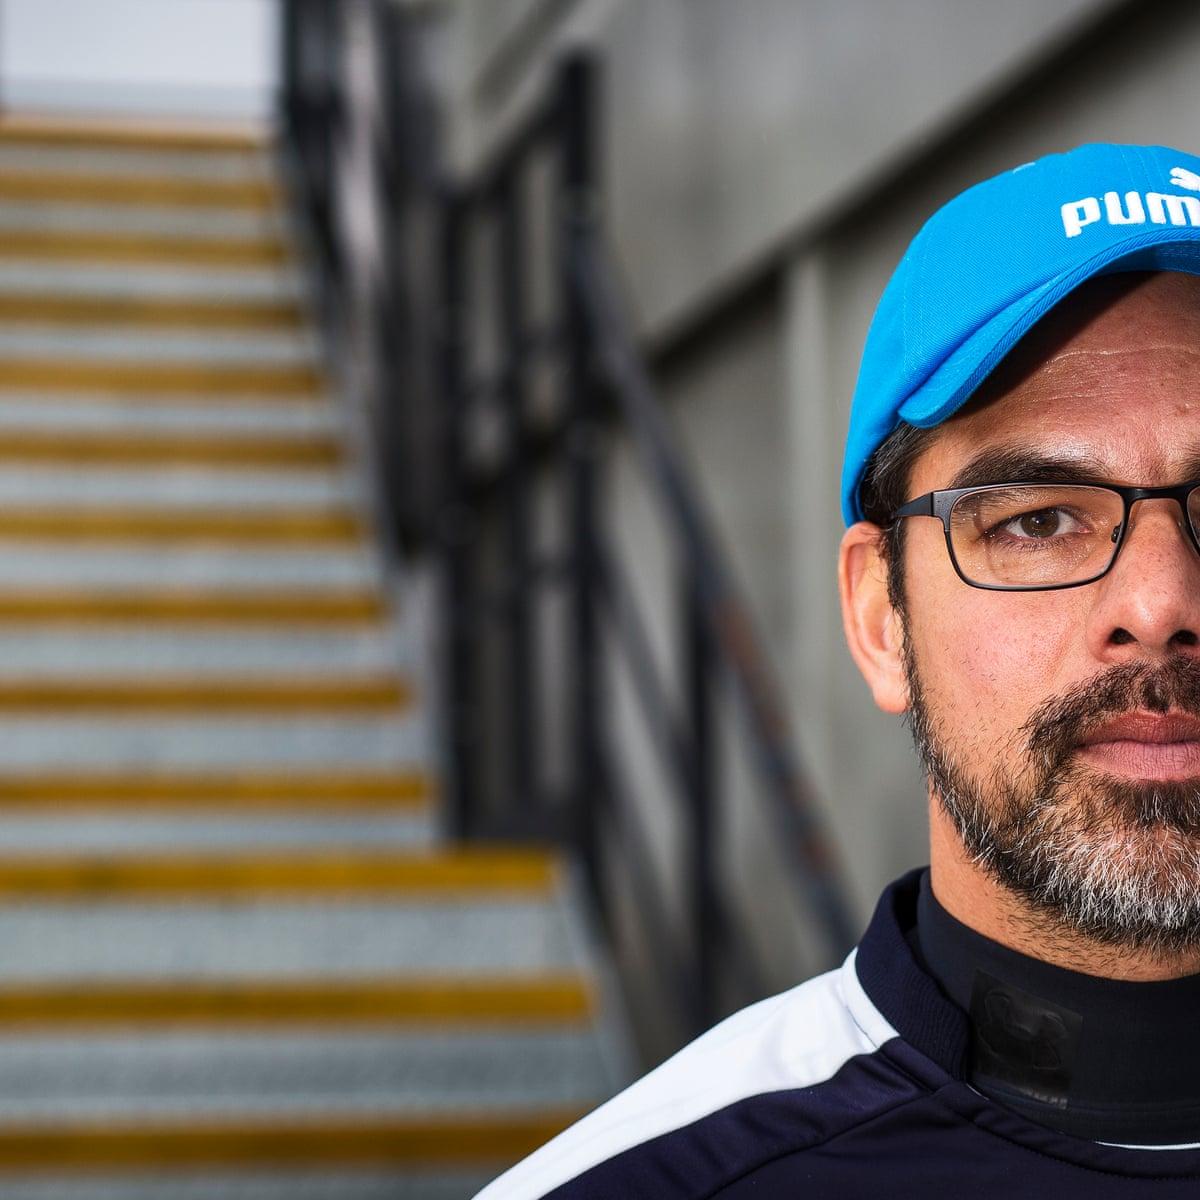 Huddersfield S David Wagner I Ve Known Jurgen Klopp Longer Than I Ve Known My Wife Huddersfield The Guardian